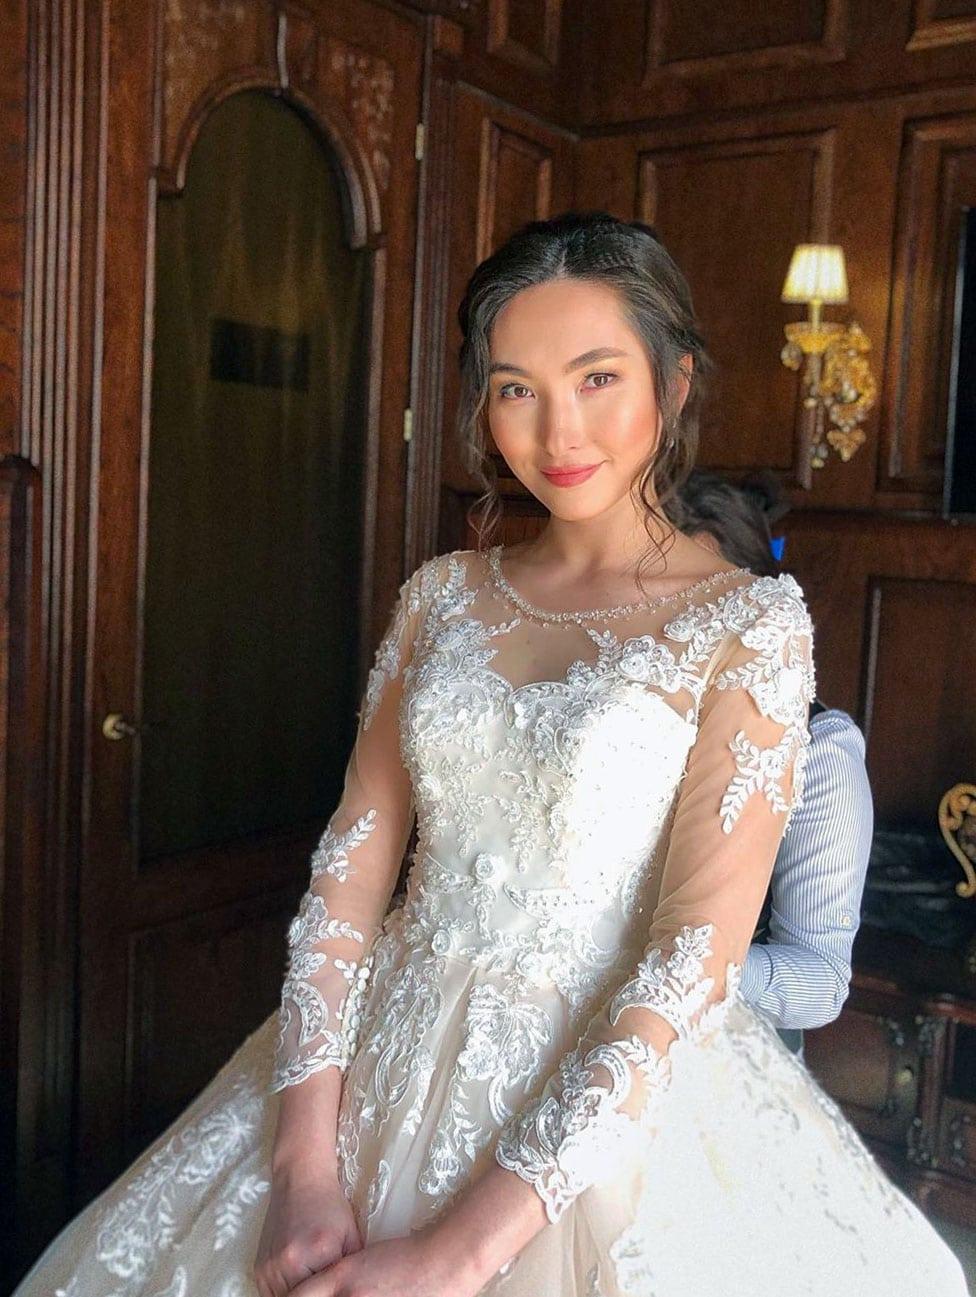 Kyrgyzstan mail order brides